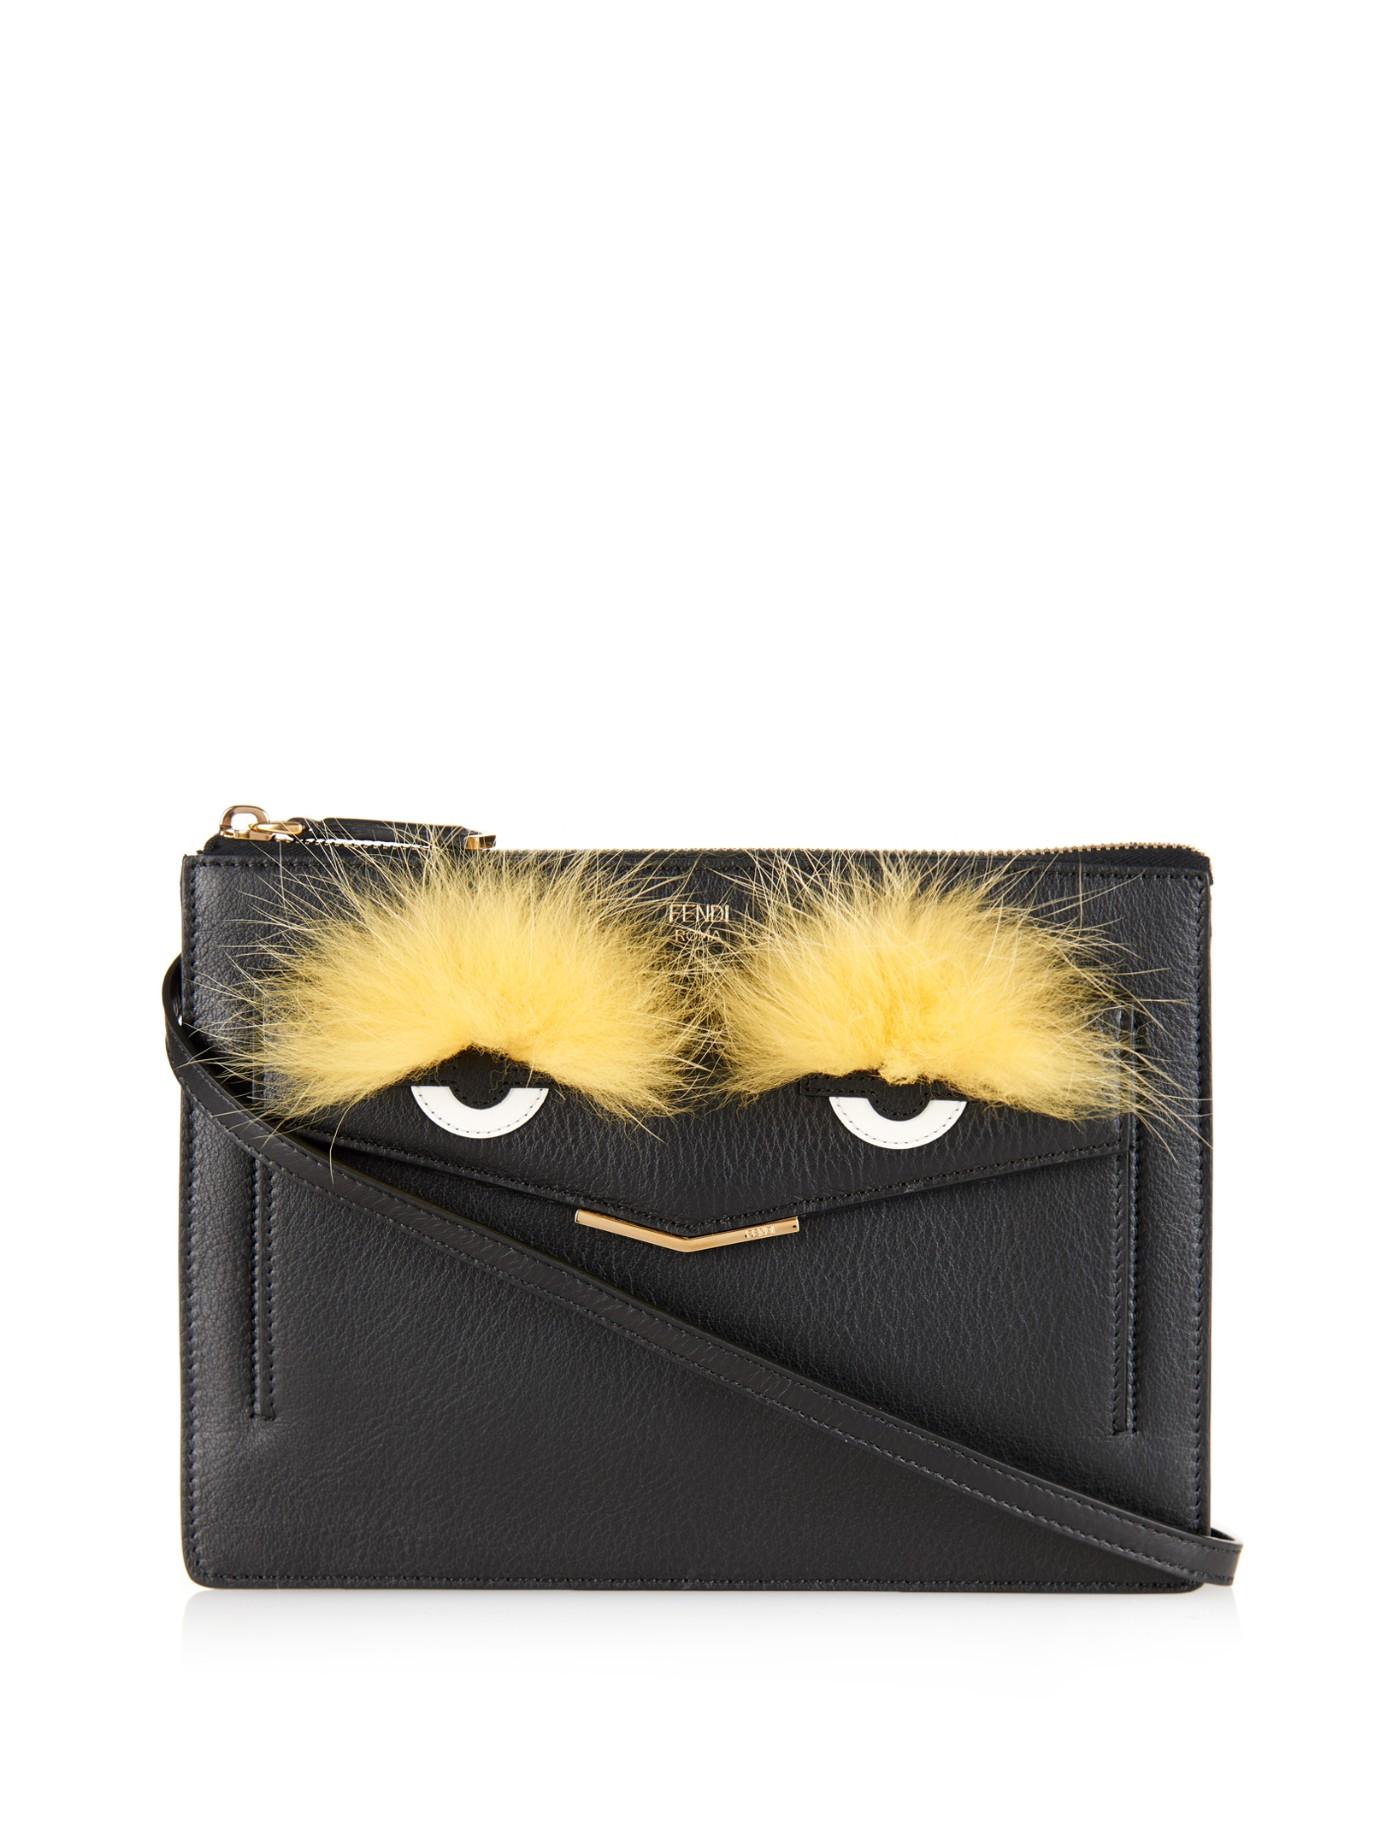 ... promo code for fendi 2jours bag bugs leather cross body bag in black  lyst 431e8 37436 9e21097f1dec0